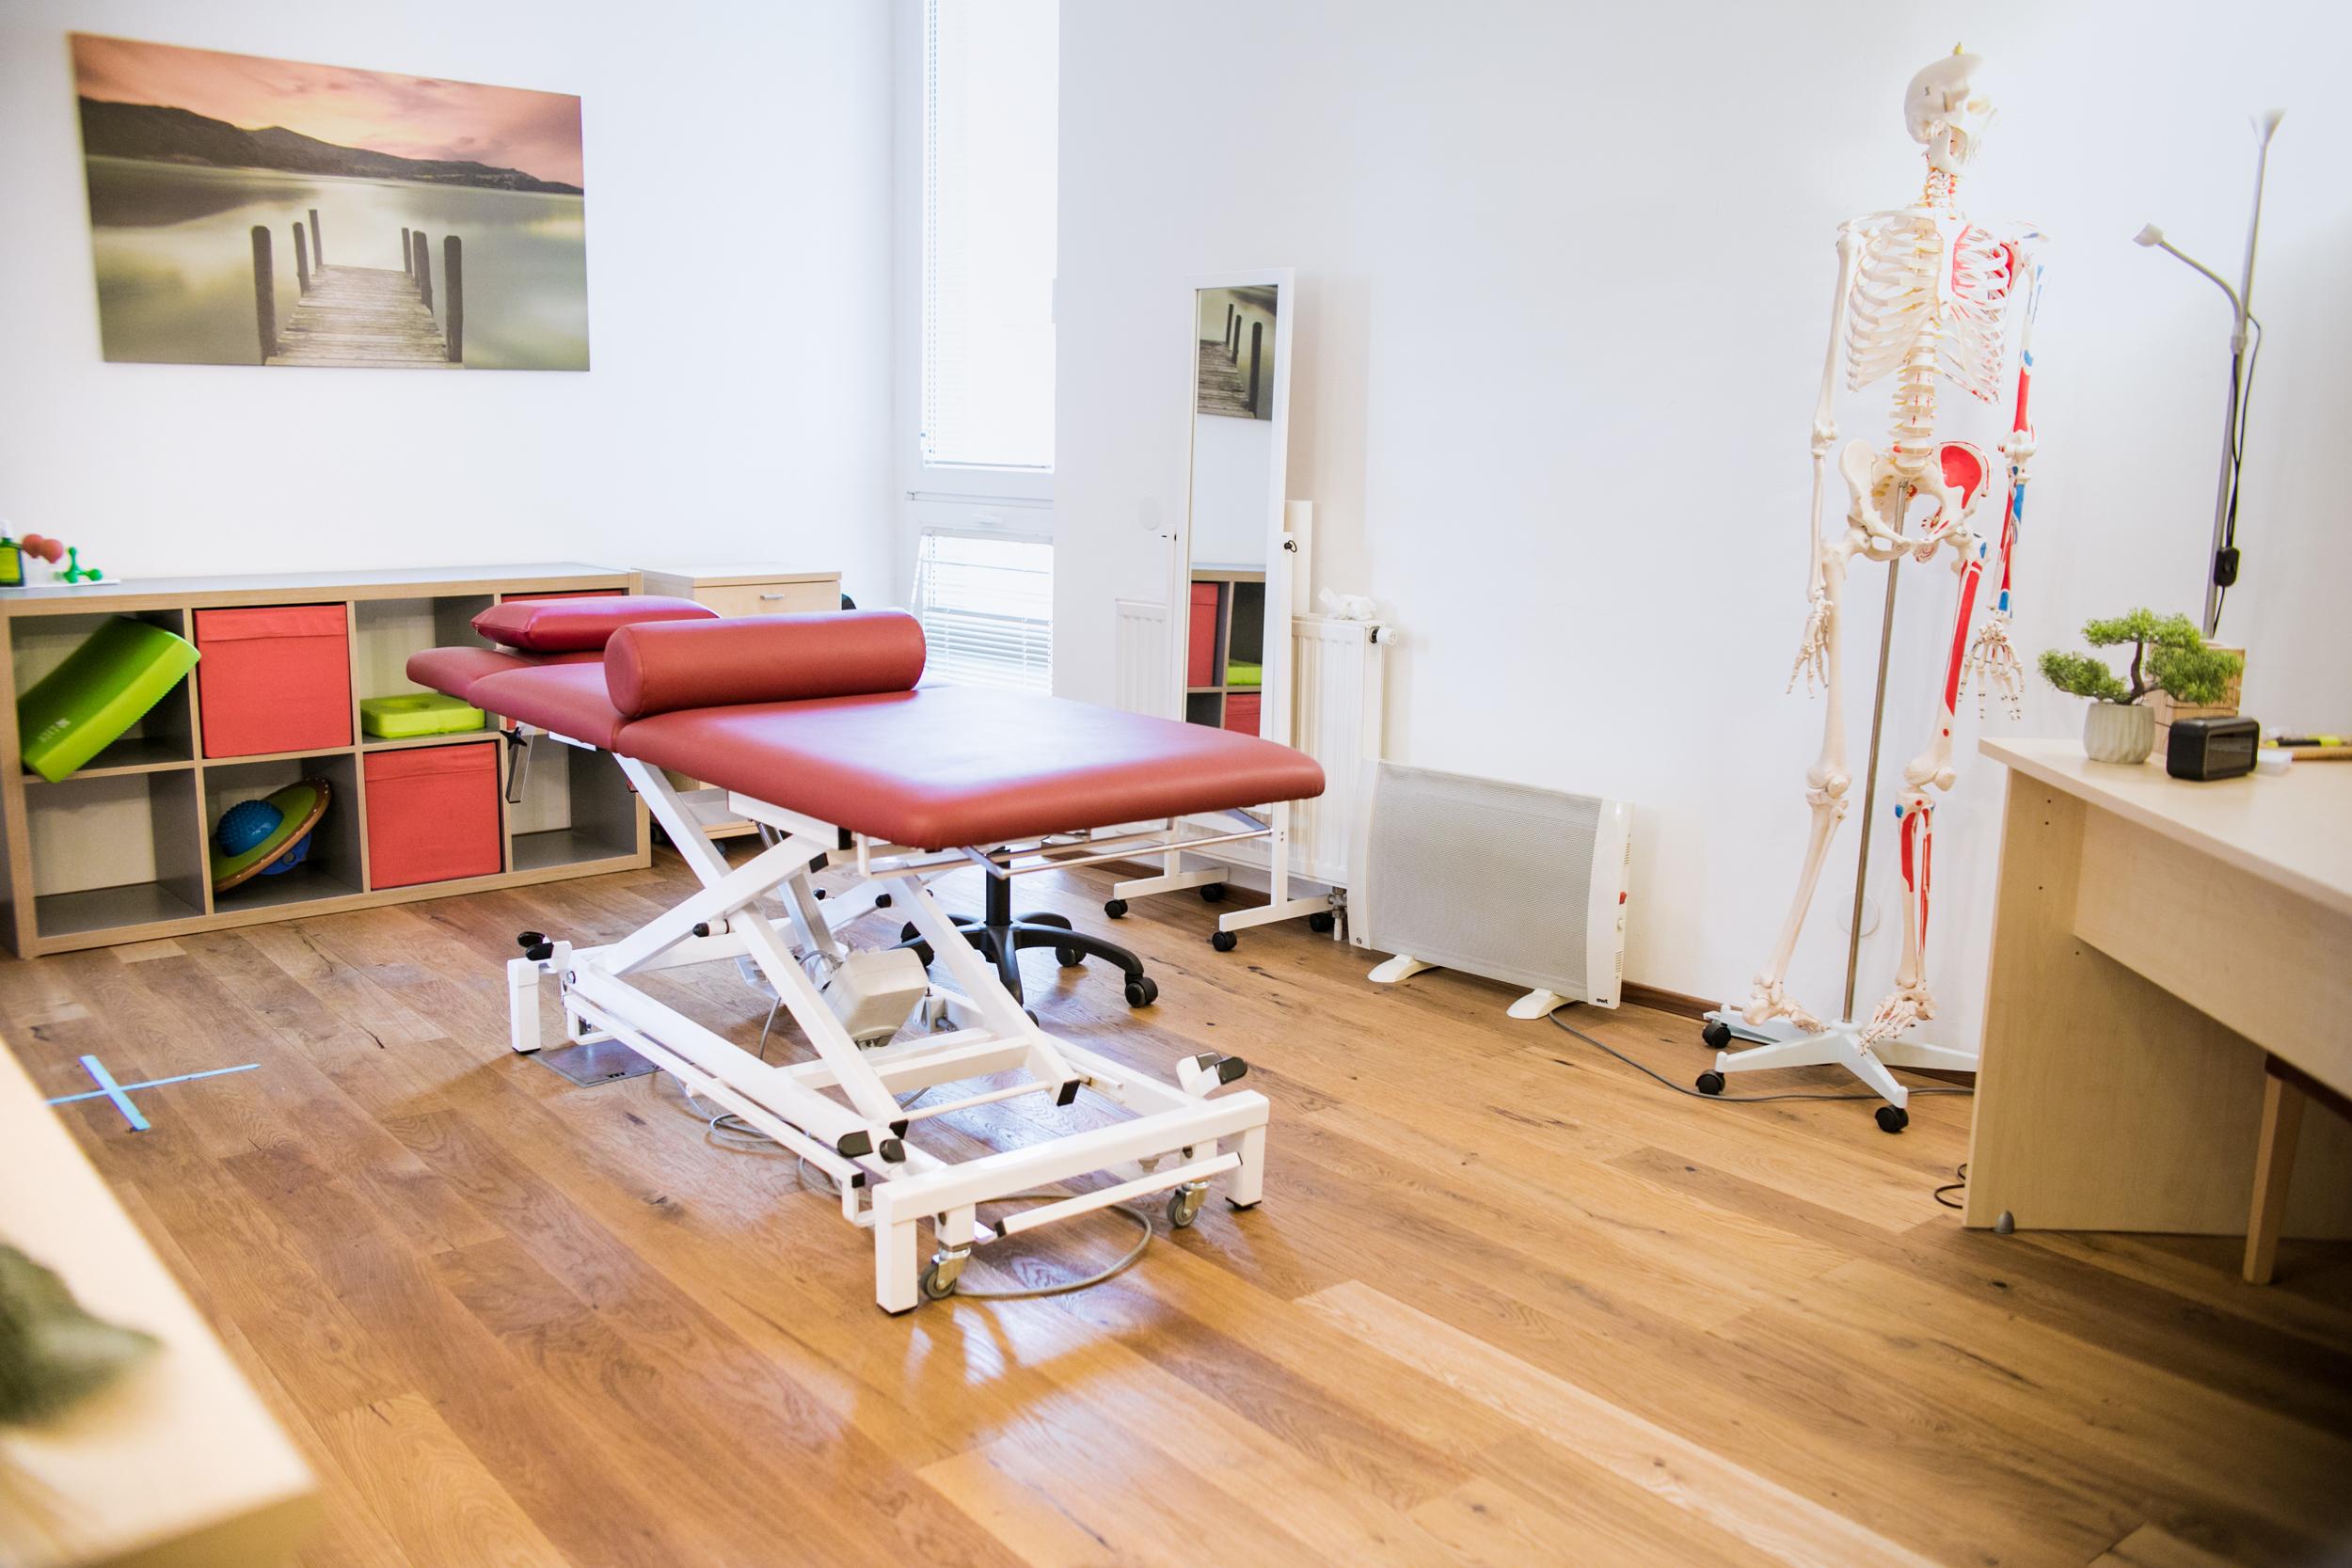 20190612_181820_IMG_4824_Skoliosetherapie-Innsbruck_VRO